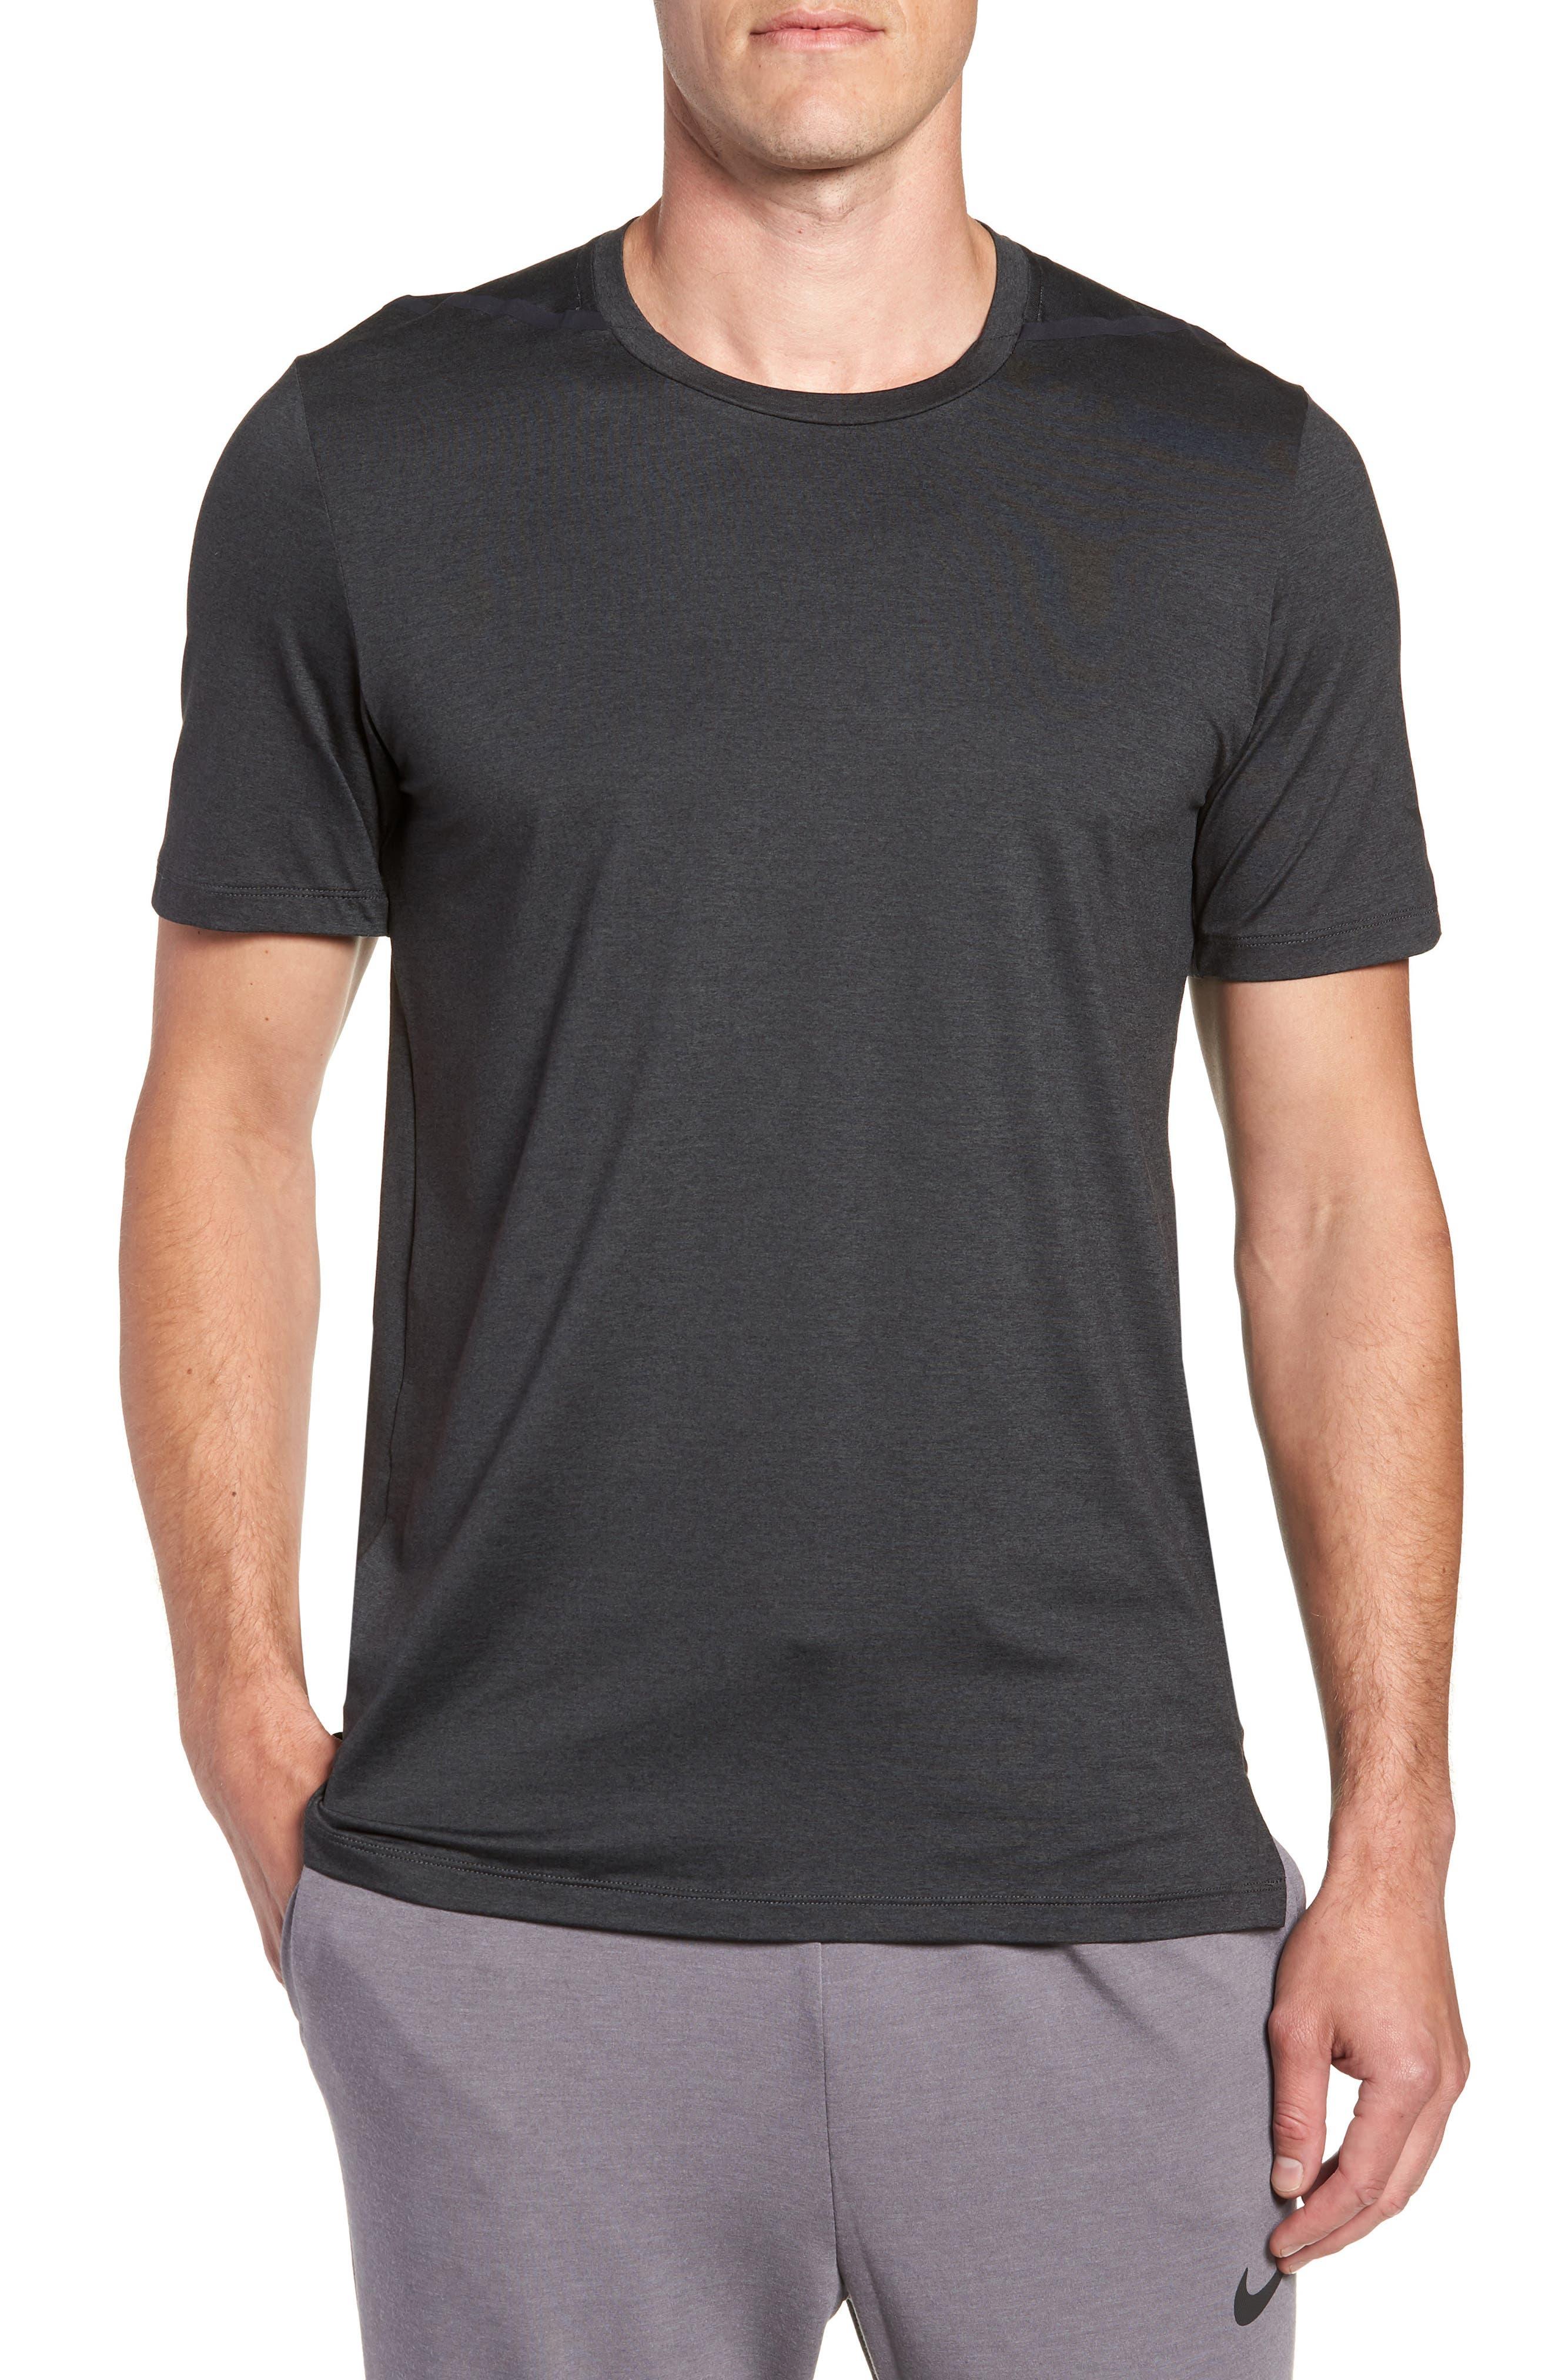 Dry Max Training T-Shirt,                             Main thumbnail 1, color,                             BLACK/ ANTHRACITE/ COBALT